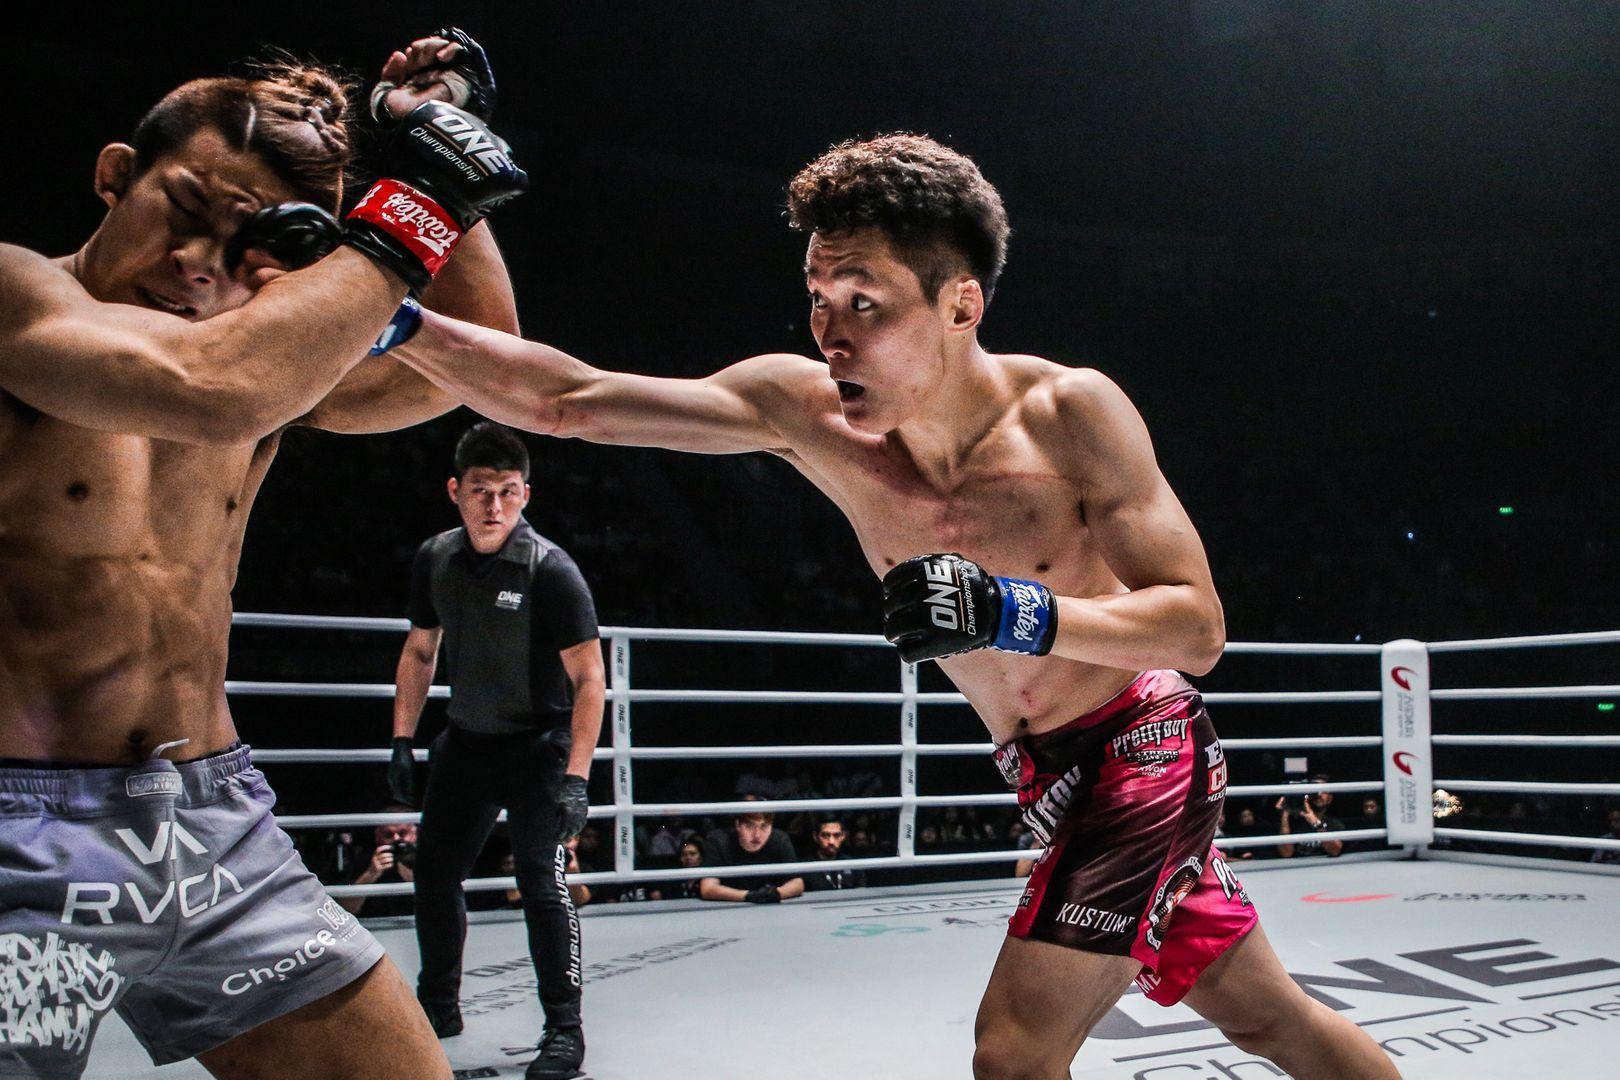 Kwon Won Il attacks Koyomi Matsushima